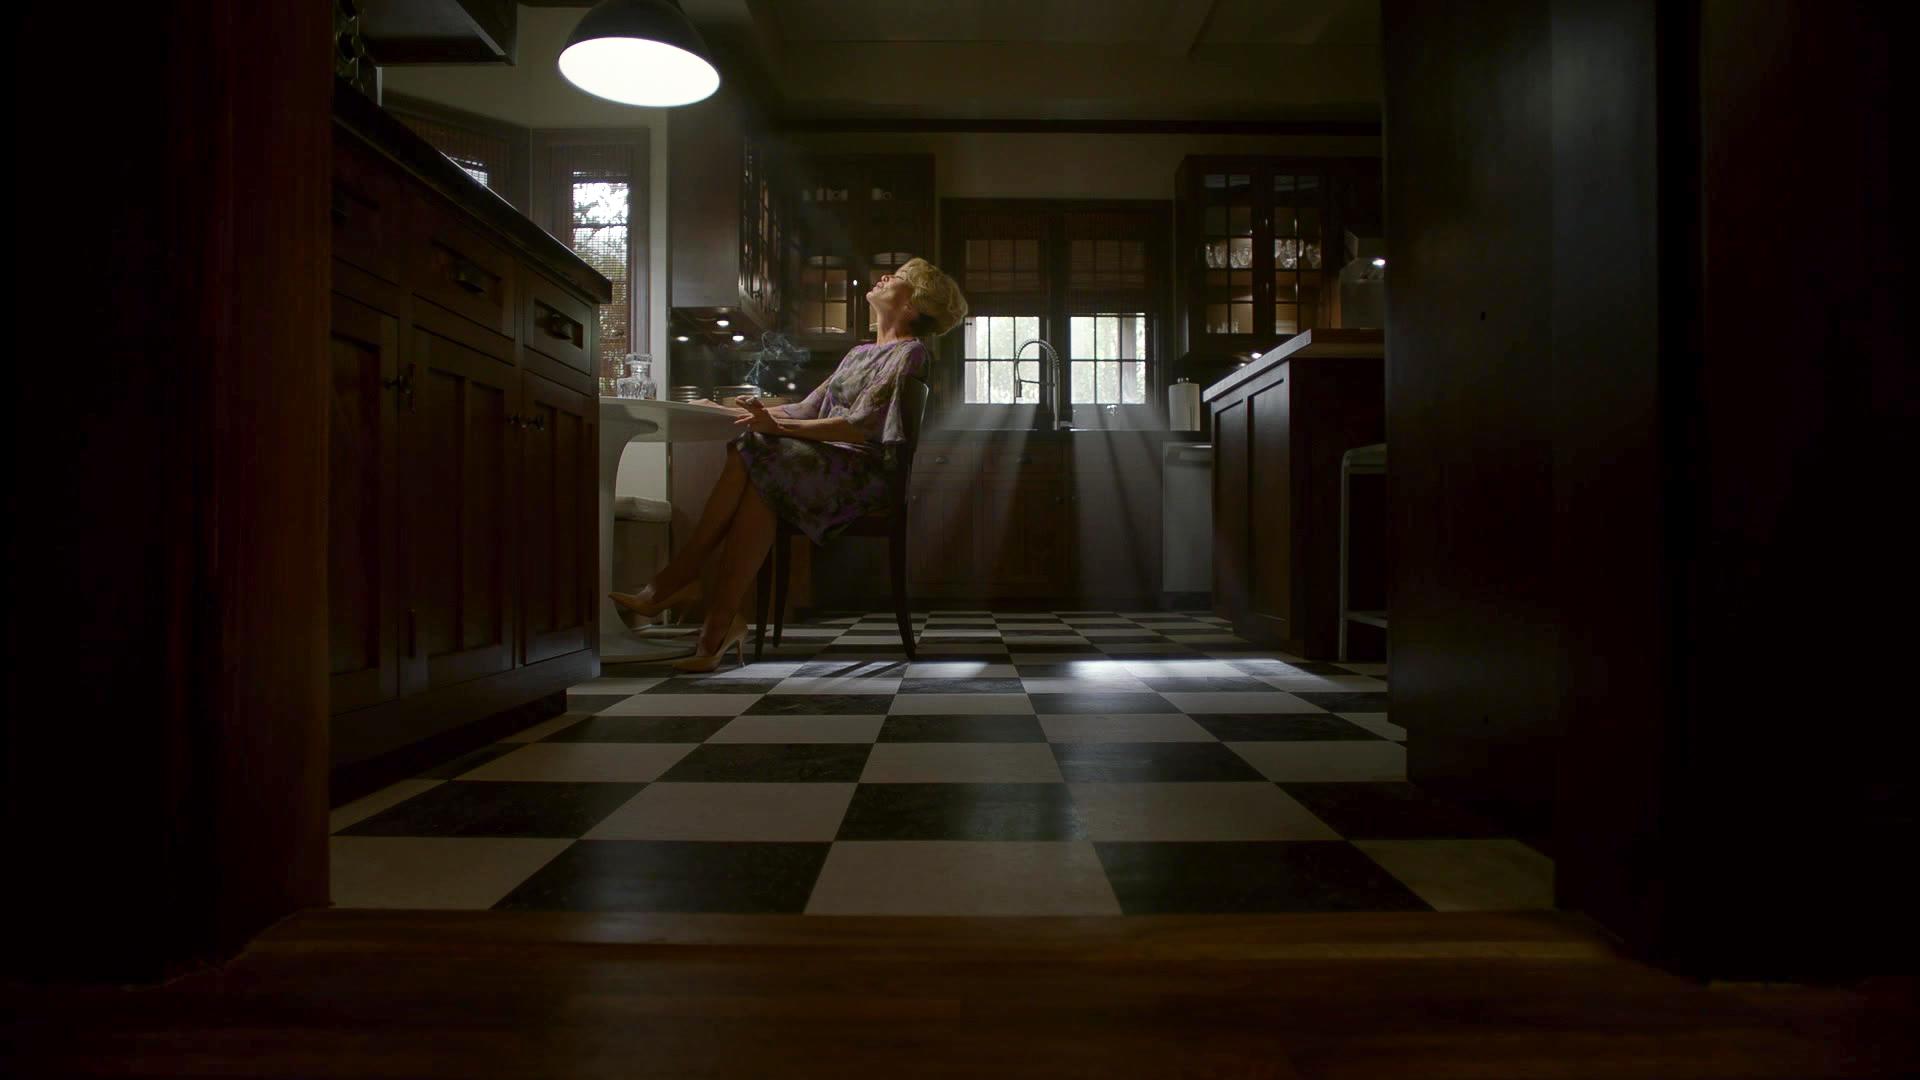 American_Horror_Story_S08E06_kissthemgooodbye_net_1250-LRCC.jpg